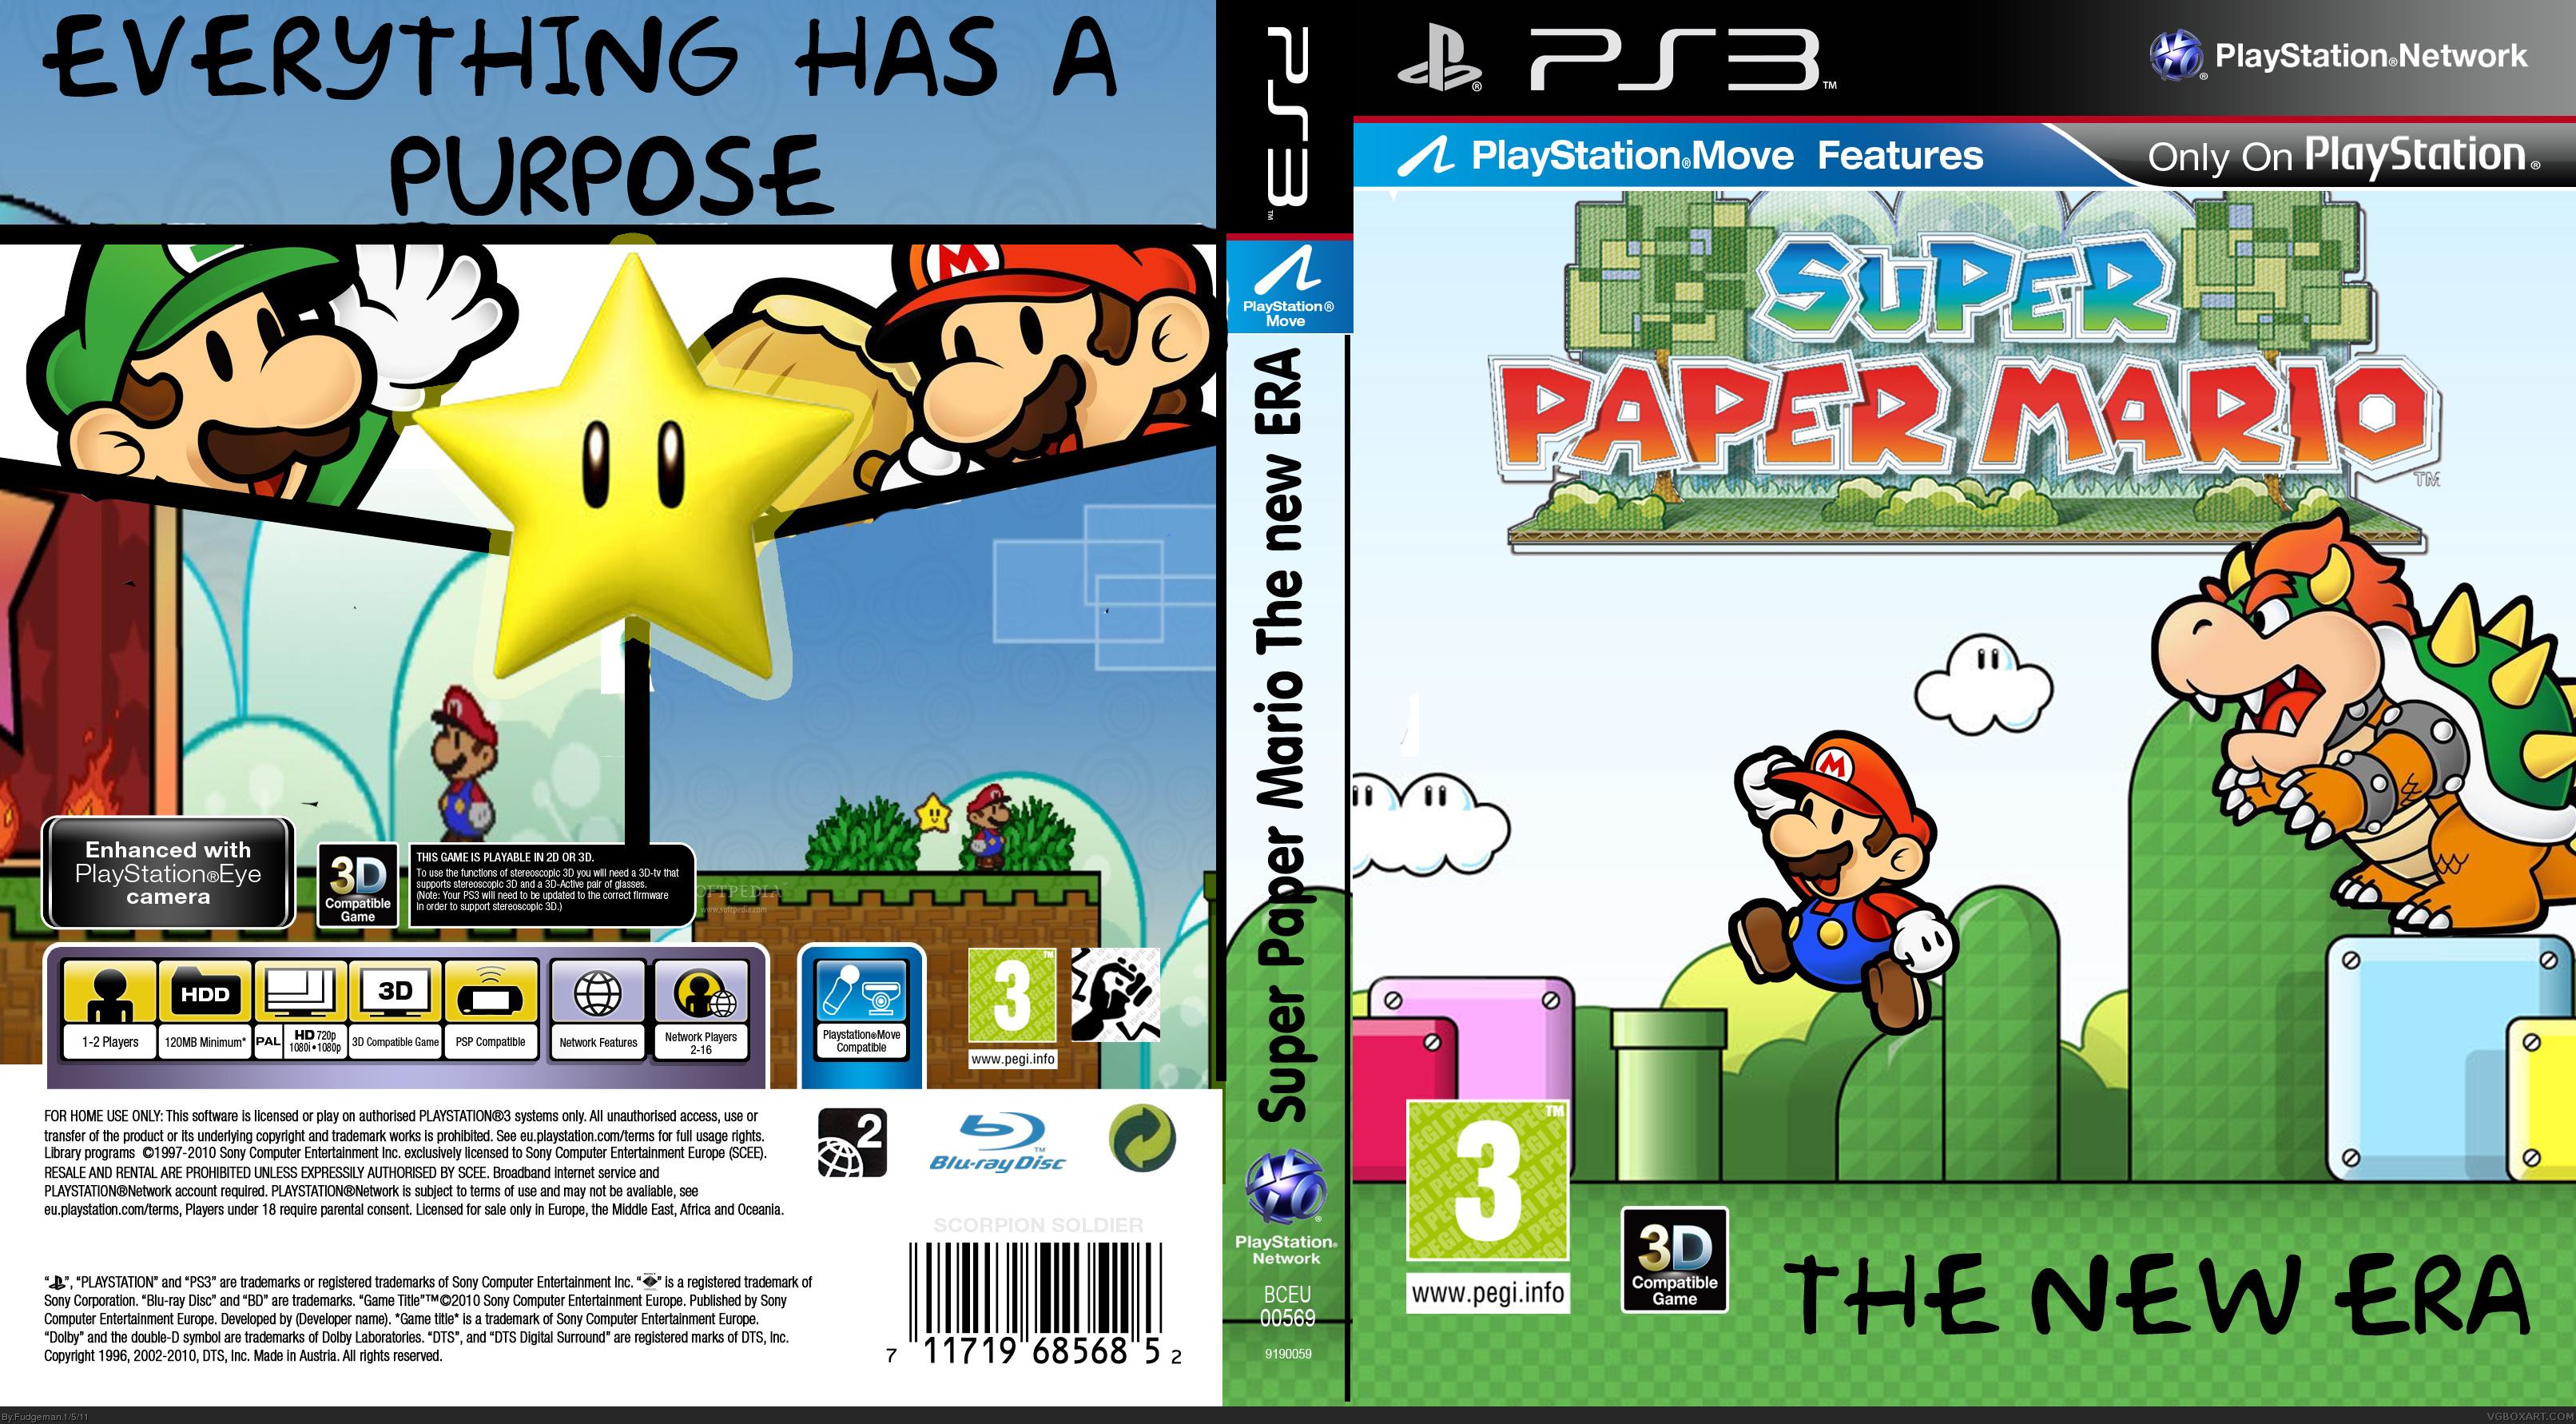 Mario Games For Ps3 : Super paper mario the new era playstation box art cover